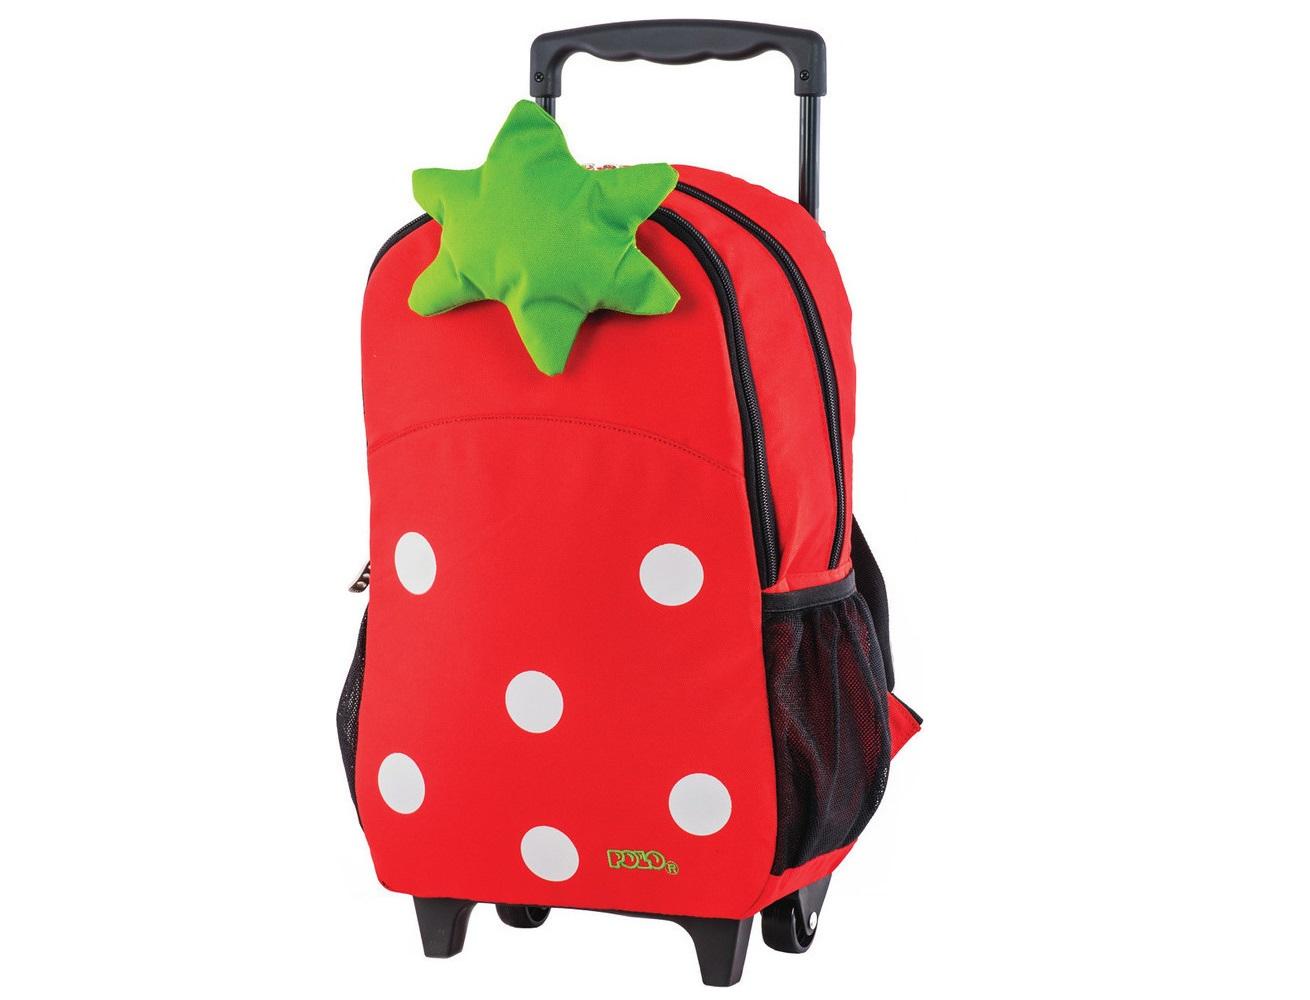 42315bdfa4 Τσάντα Τρόλεϋ Νηπιαγωγείου Polo Φράουλα - Lexicon Shop